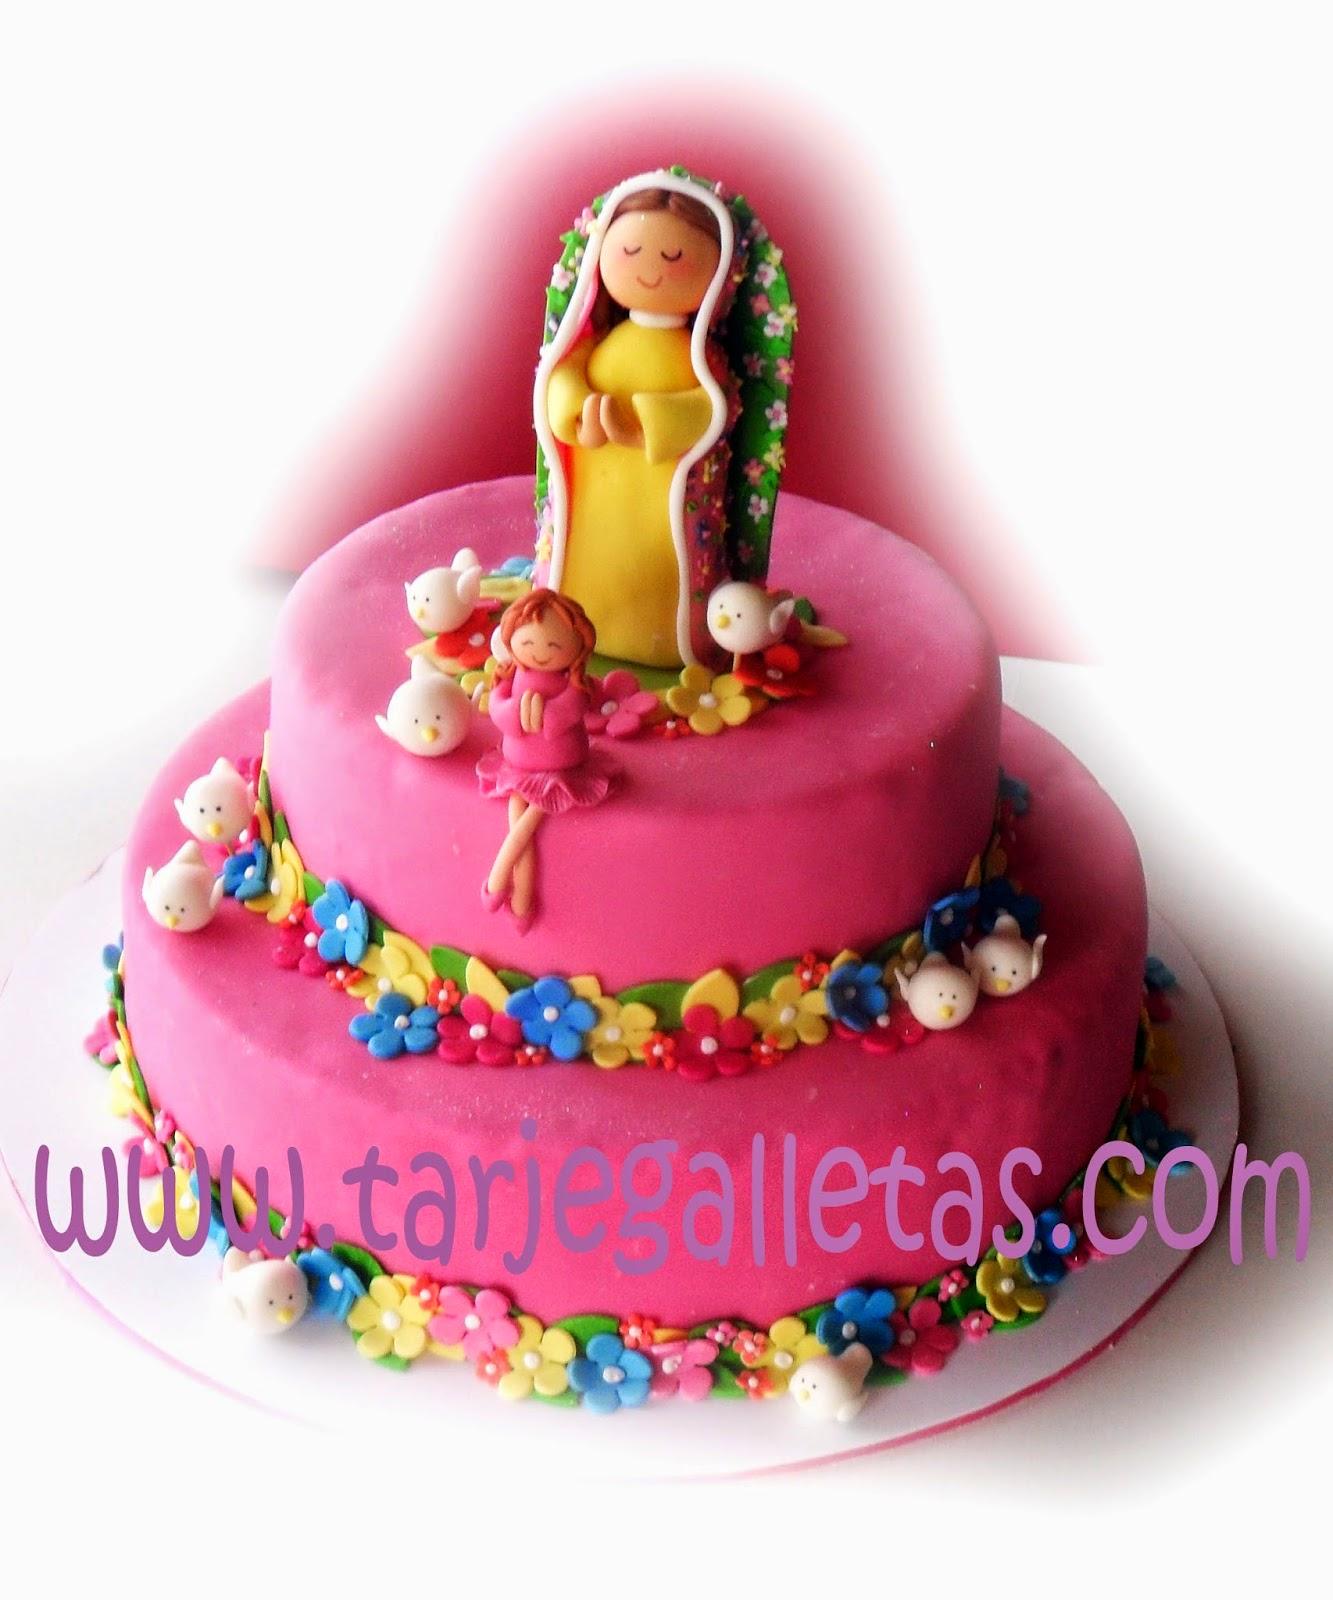 Decoracion Primera Comunion Virgen De Guadalupe ~ TARJEGALLETAS Espectacular torta de Primera Comuni?n, para una ni?a